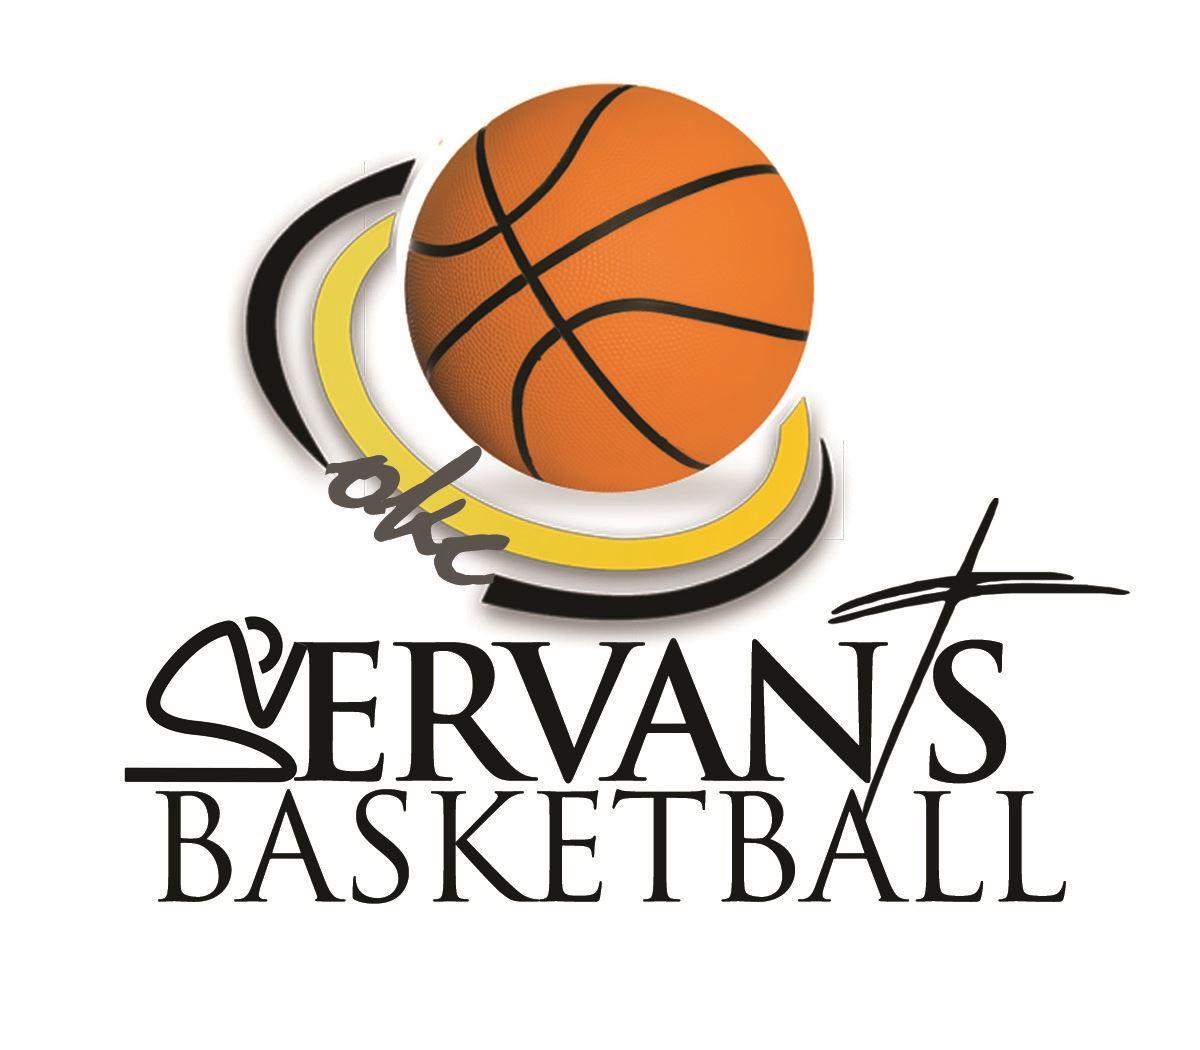 Servants Basketball - Servants Basketball